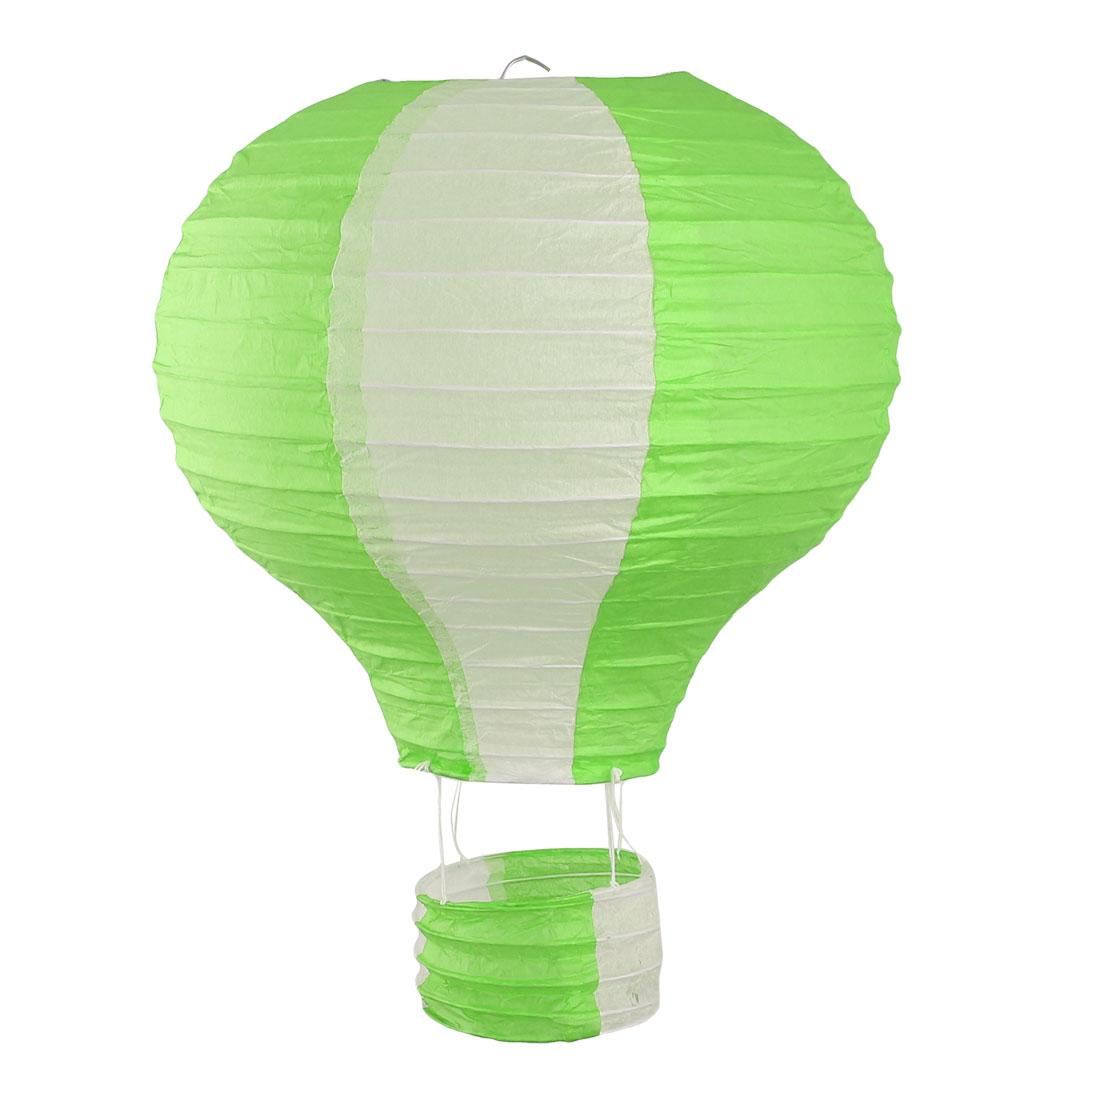 Restaurant Party Paper Lightless Hanging DIY Decor Hot Air Balloon Lantern Green White 10 Inch Dia